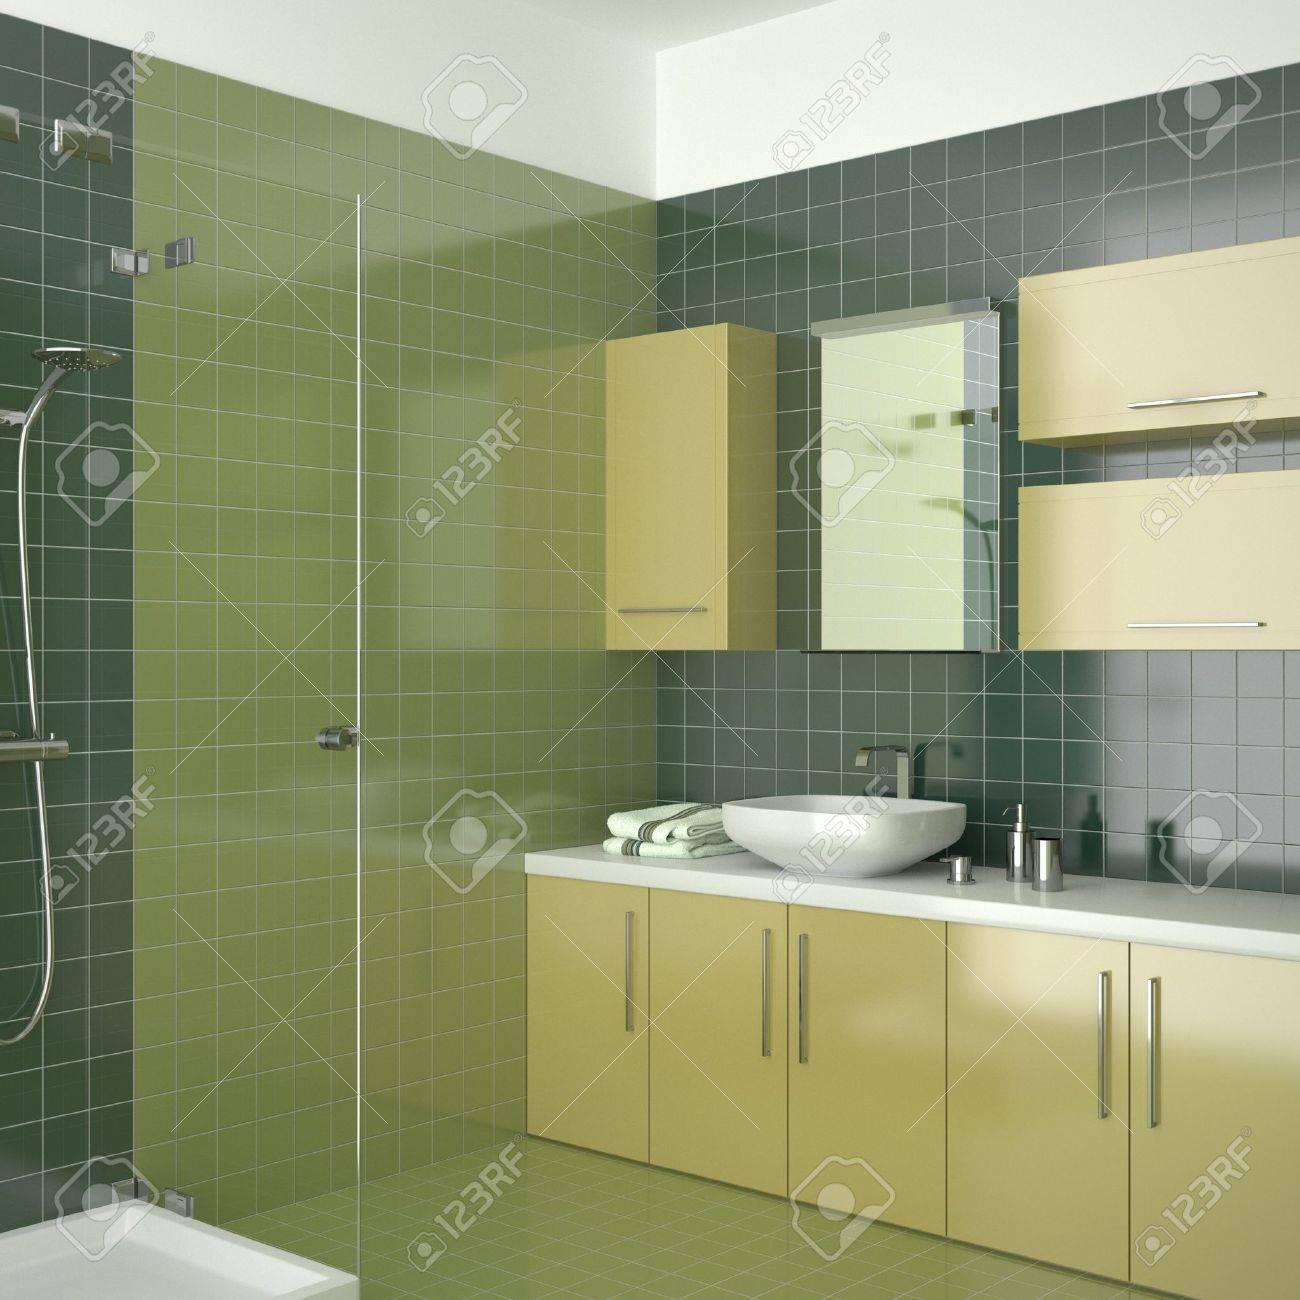 modern green bathroom with yellow furniture Stock Photo - 8574625